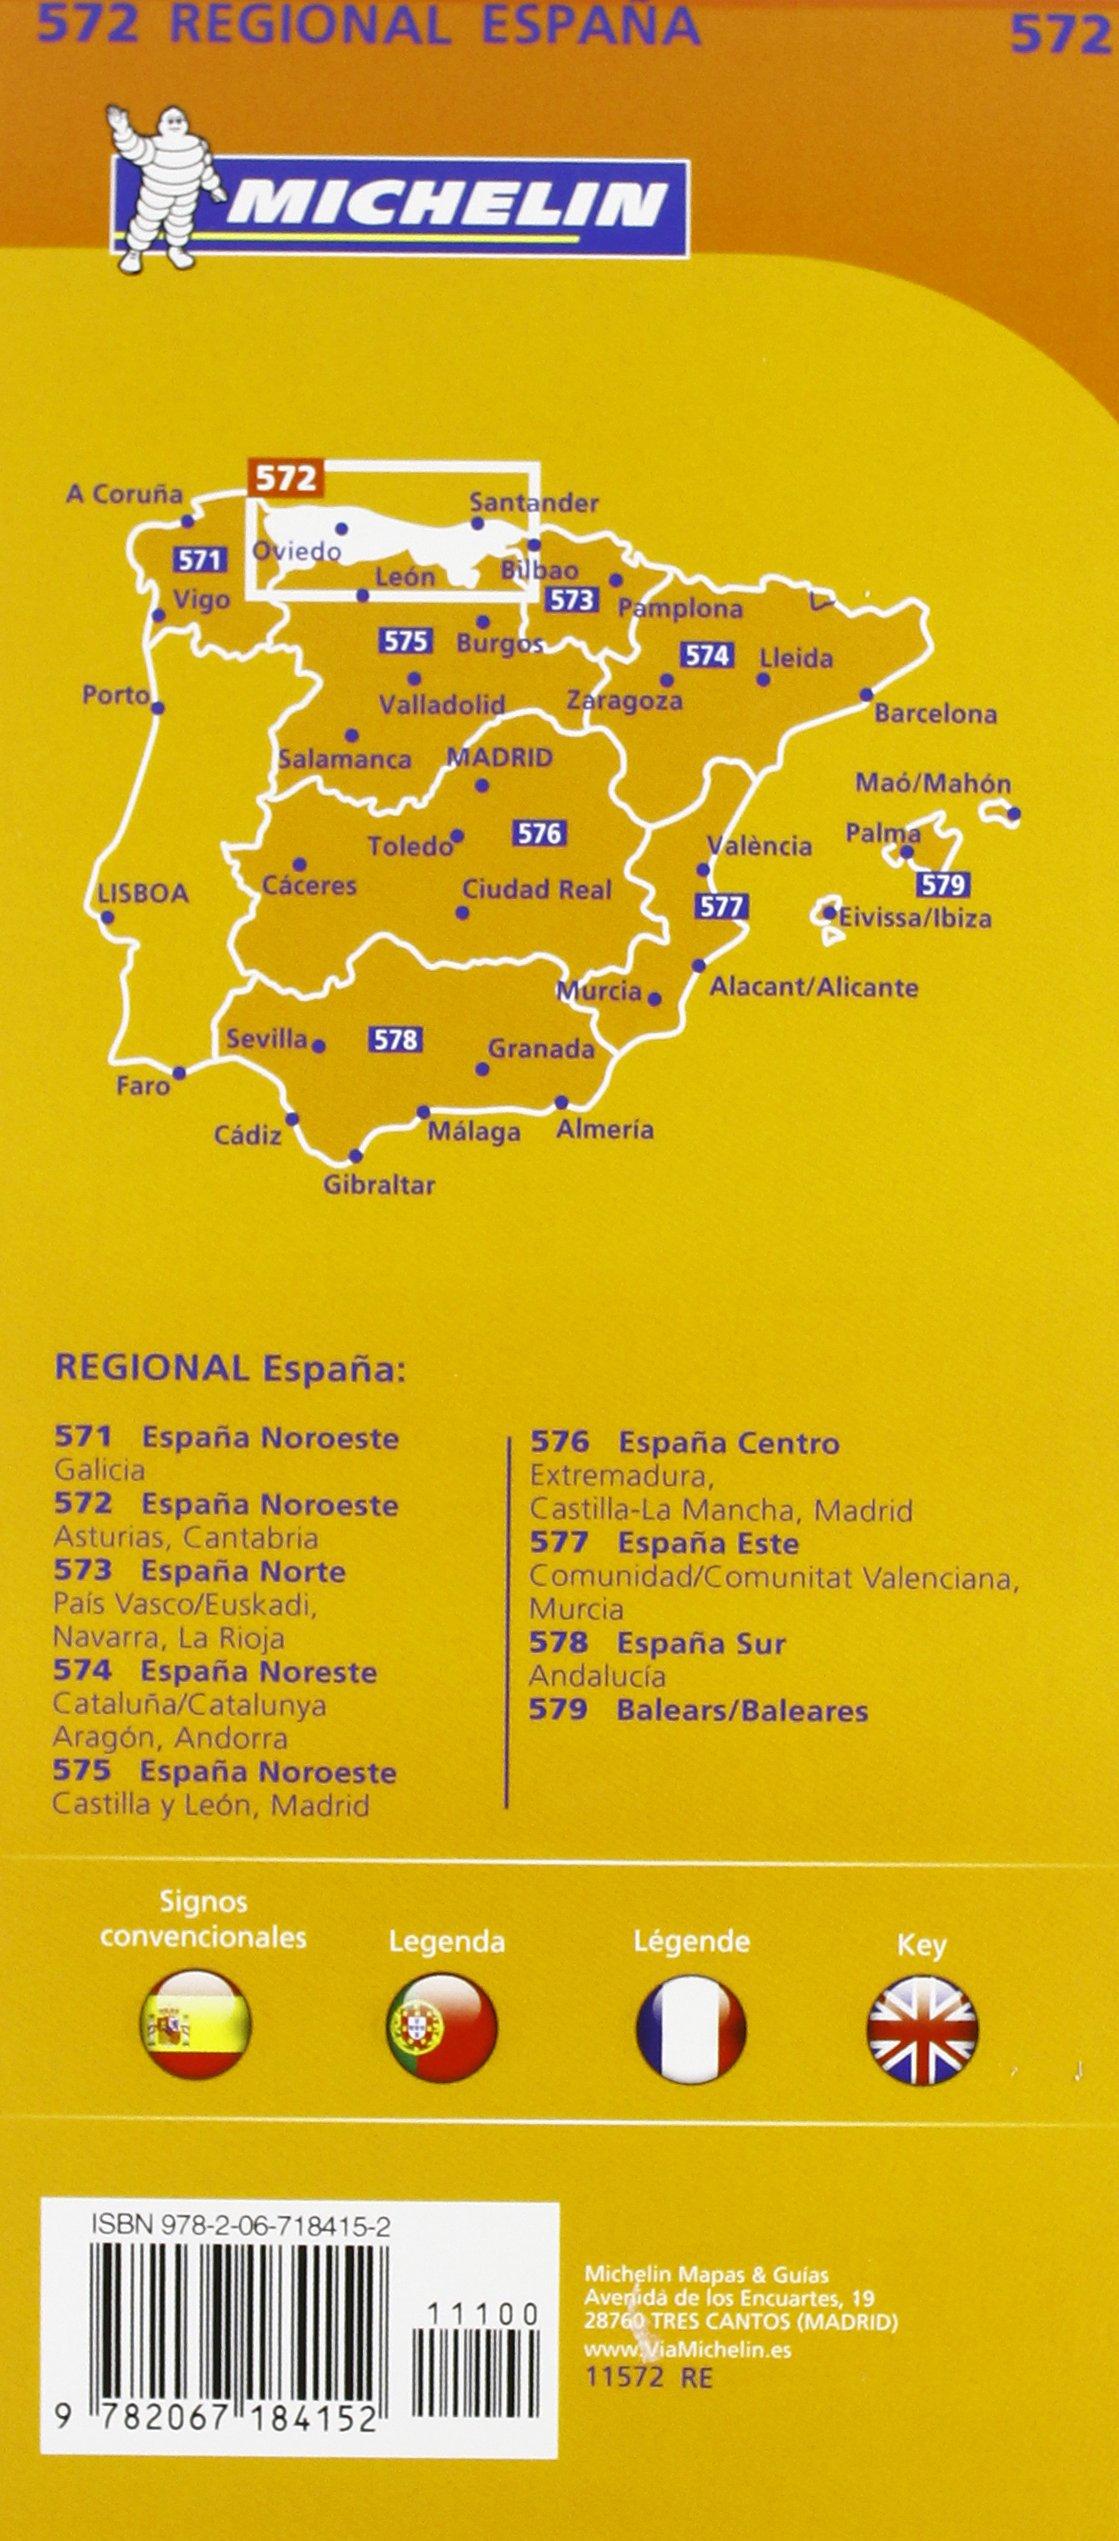 Mapa Regional Asturias, Cantabria (Carte regionali): Amazon.es: Vv.Aa, Vv.Aa: Libros